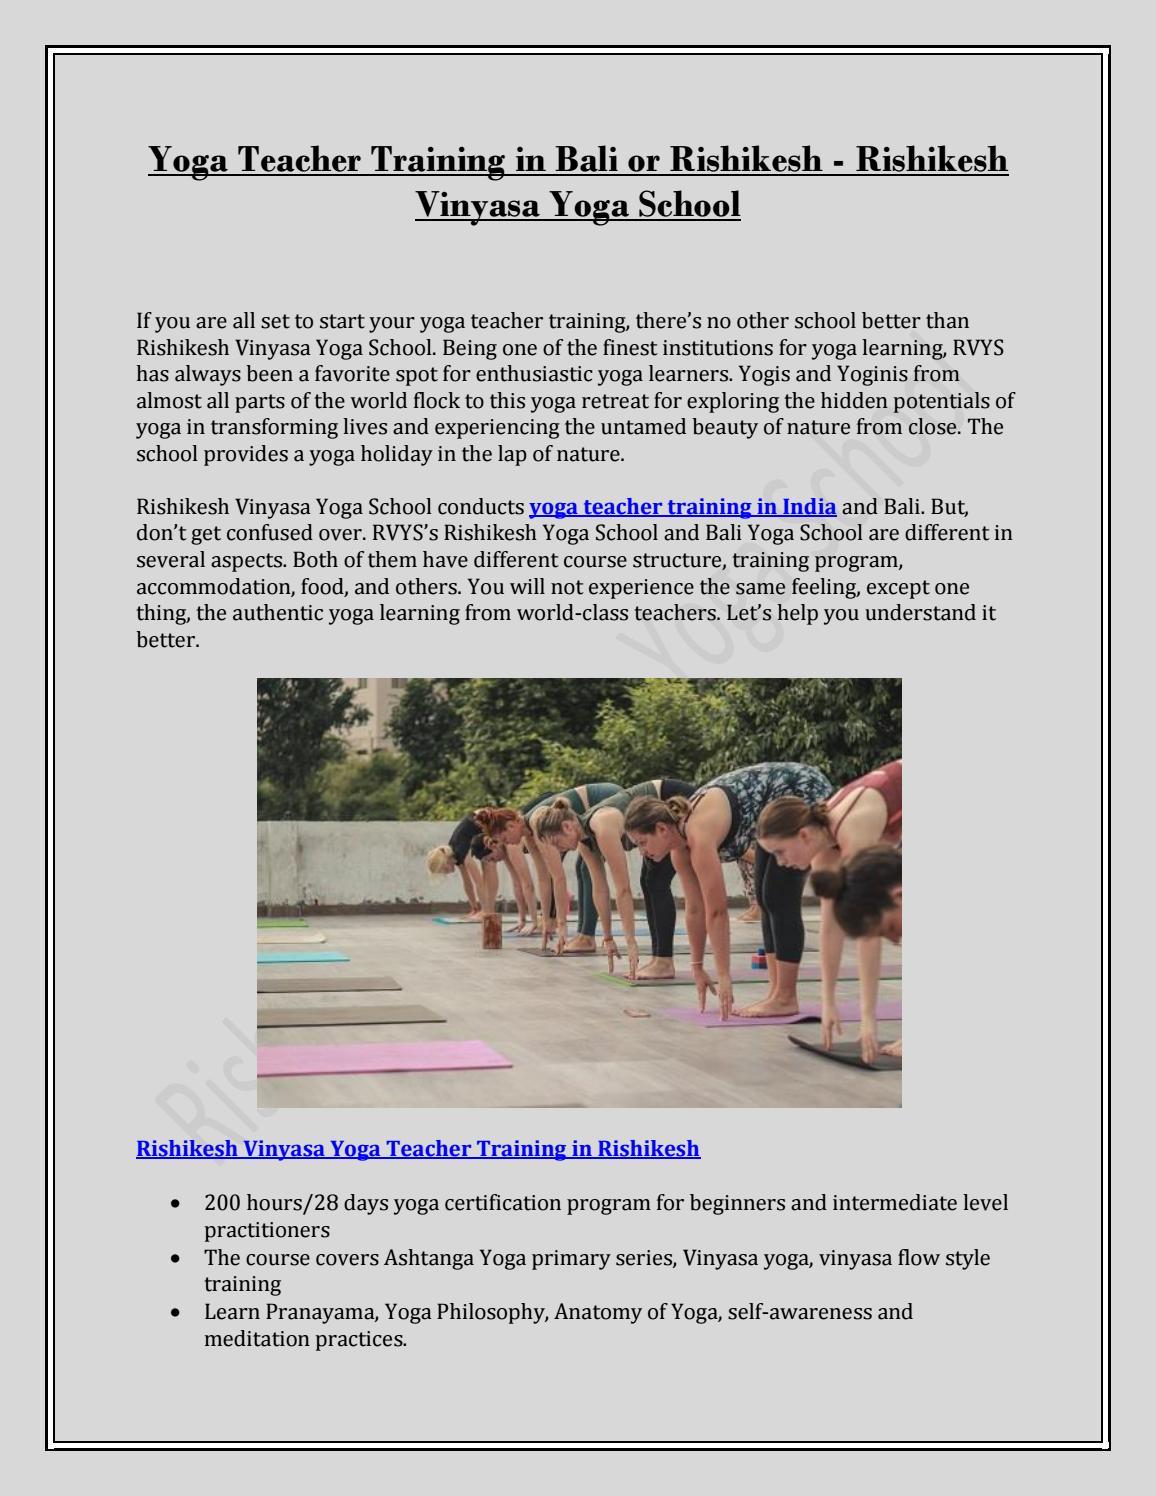 Yoga Teacher Training In Bali Or Rishikesh Rishikesh Vinyasa Yoga School By Rishikesh Vinyasa Yoga School Issuu